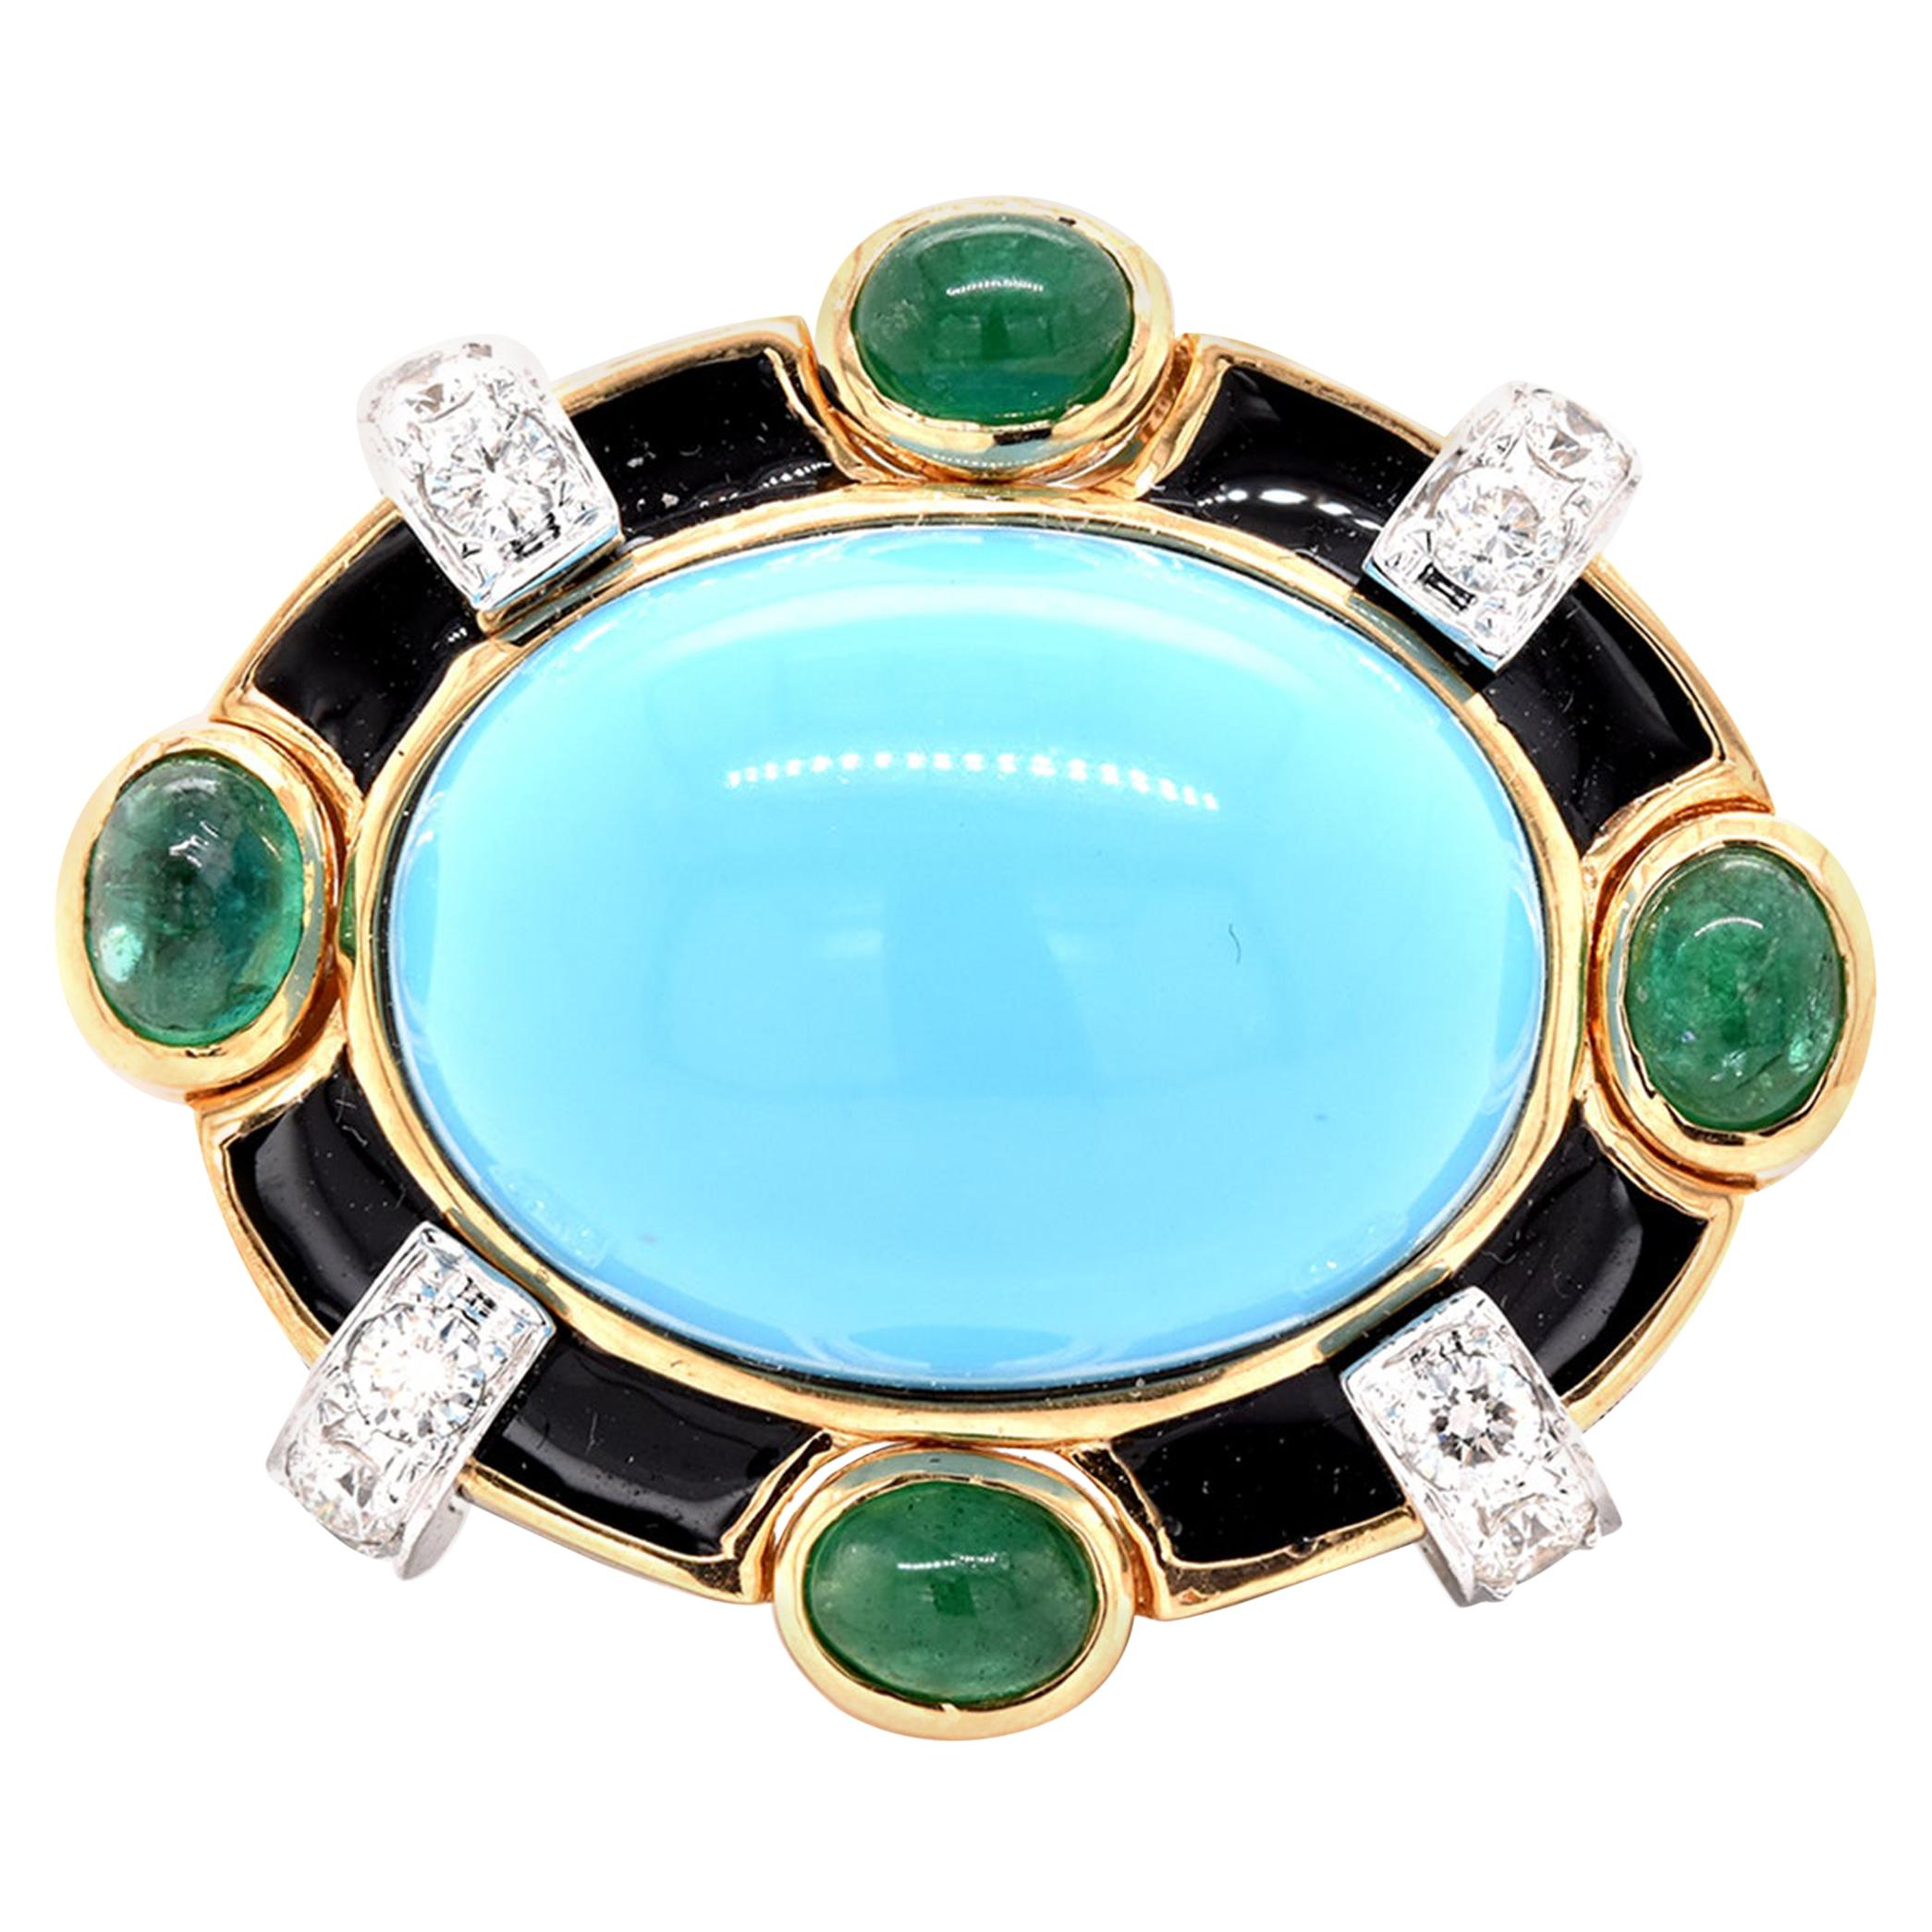 18 Karat Yellow Gold Turquoise, Emerald, Diamond, and Black Enamel Ring